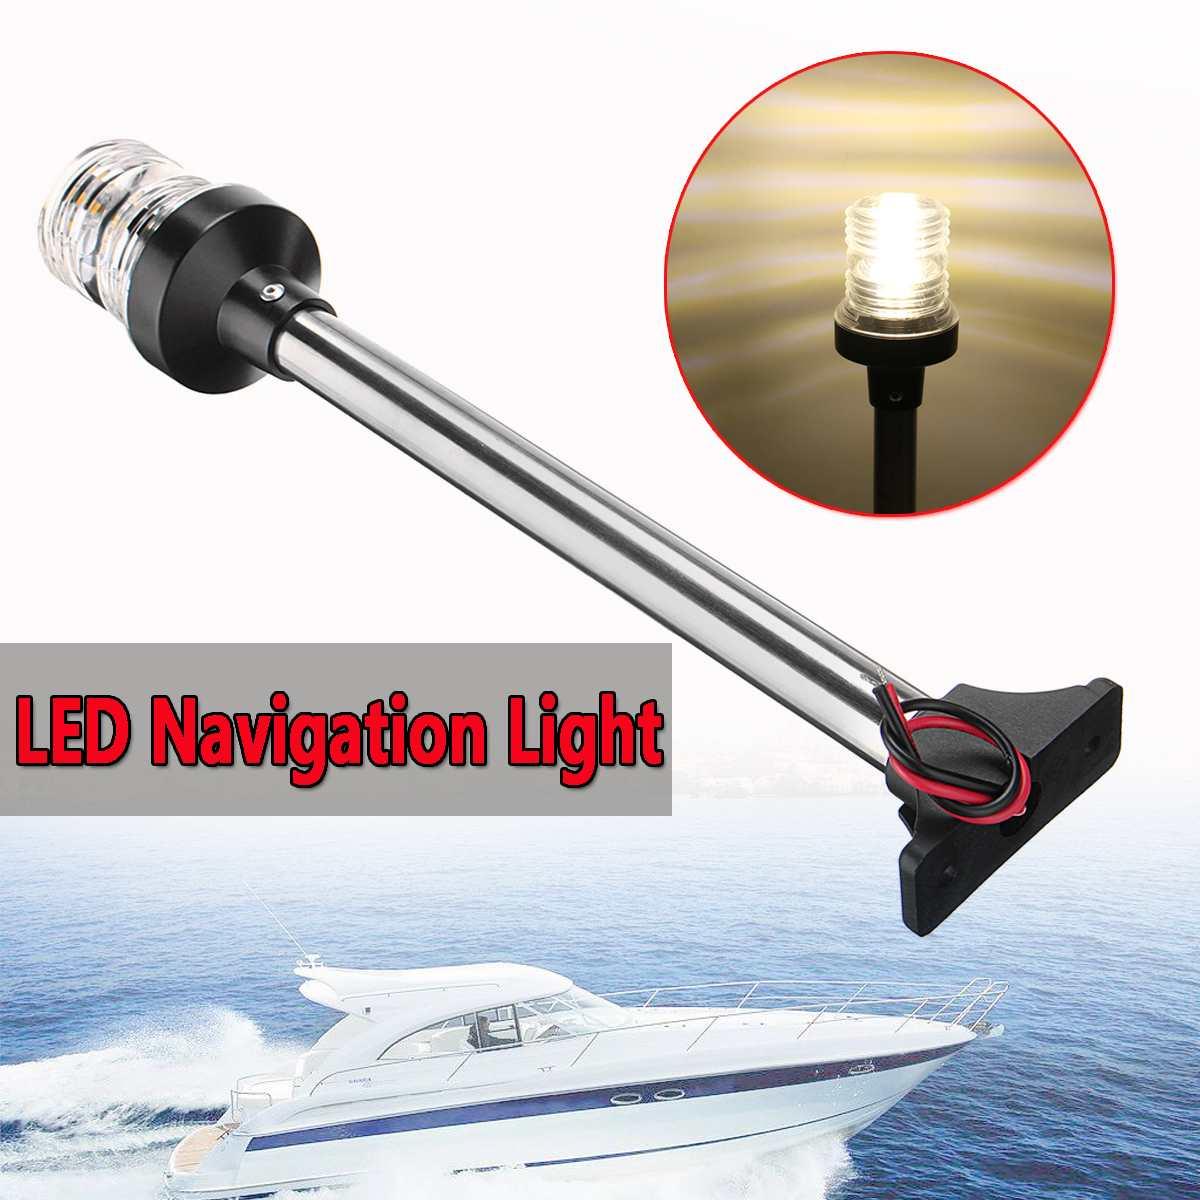 New 33cm LED Navigation Lights Yacht Boat New Pactrade Marine LED Navigation Light For Boat Light All Round Light 360 Degree